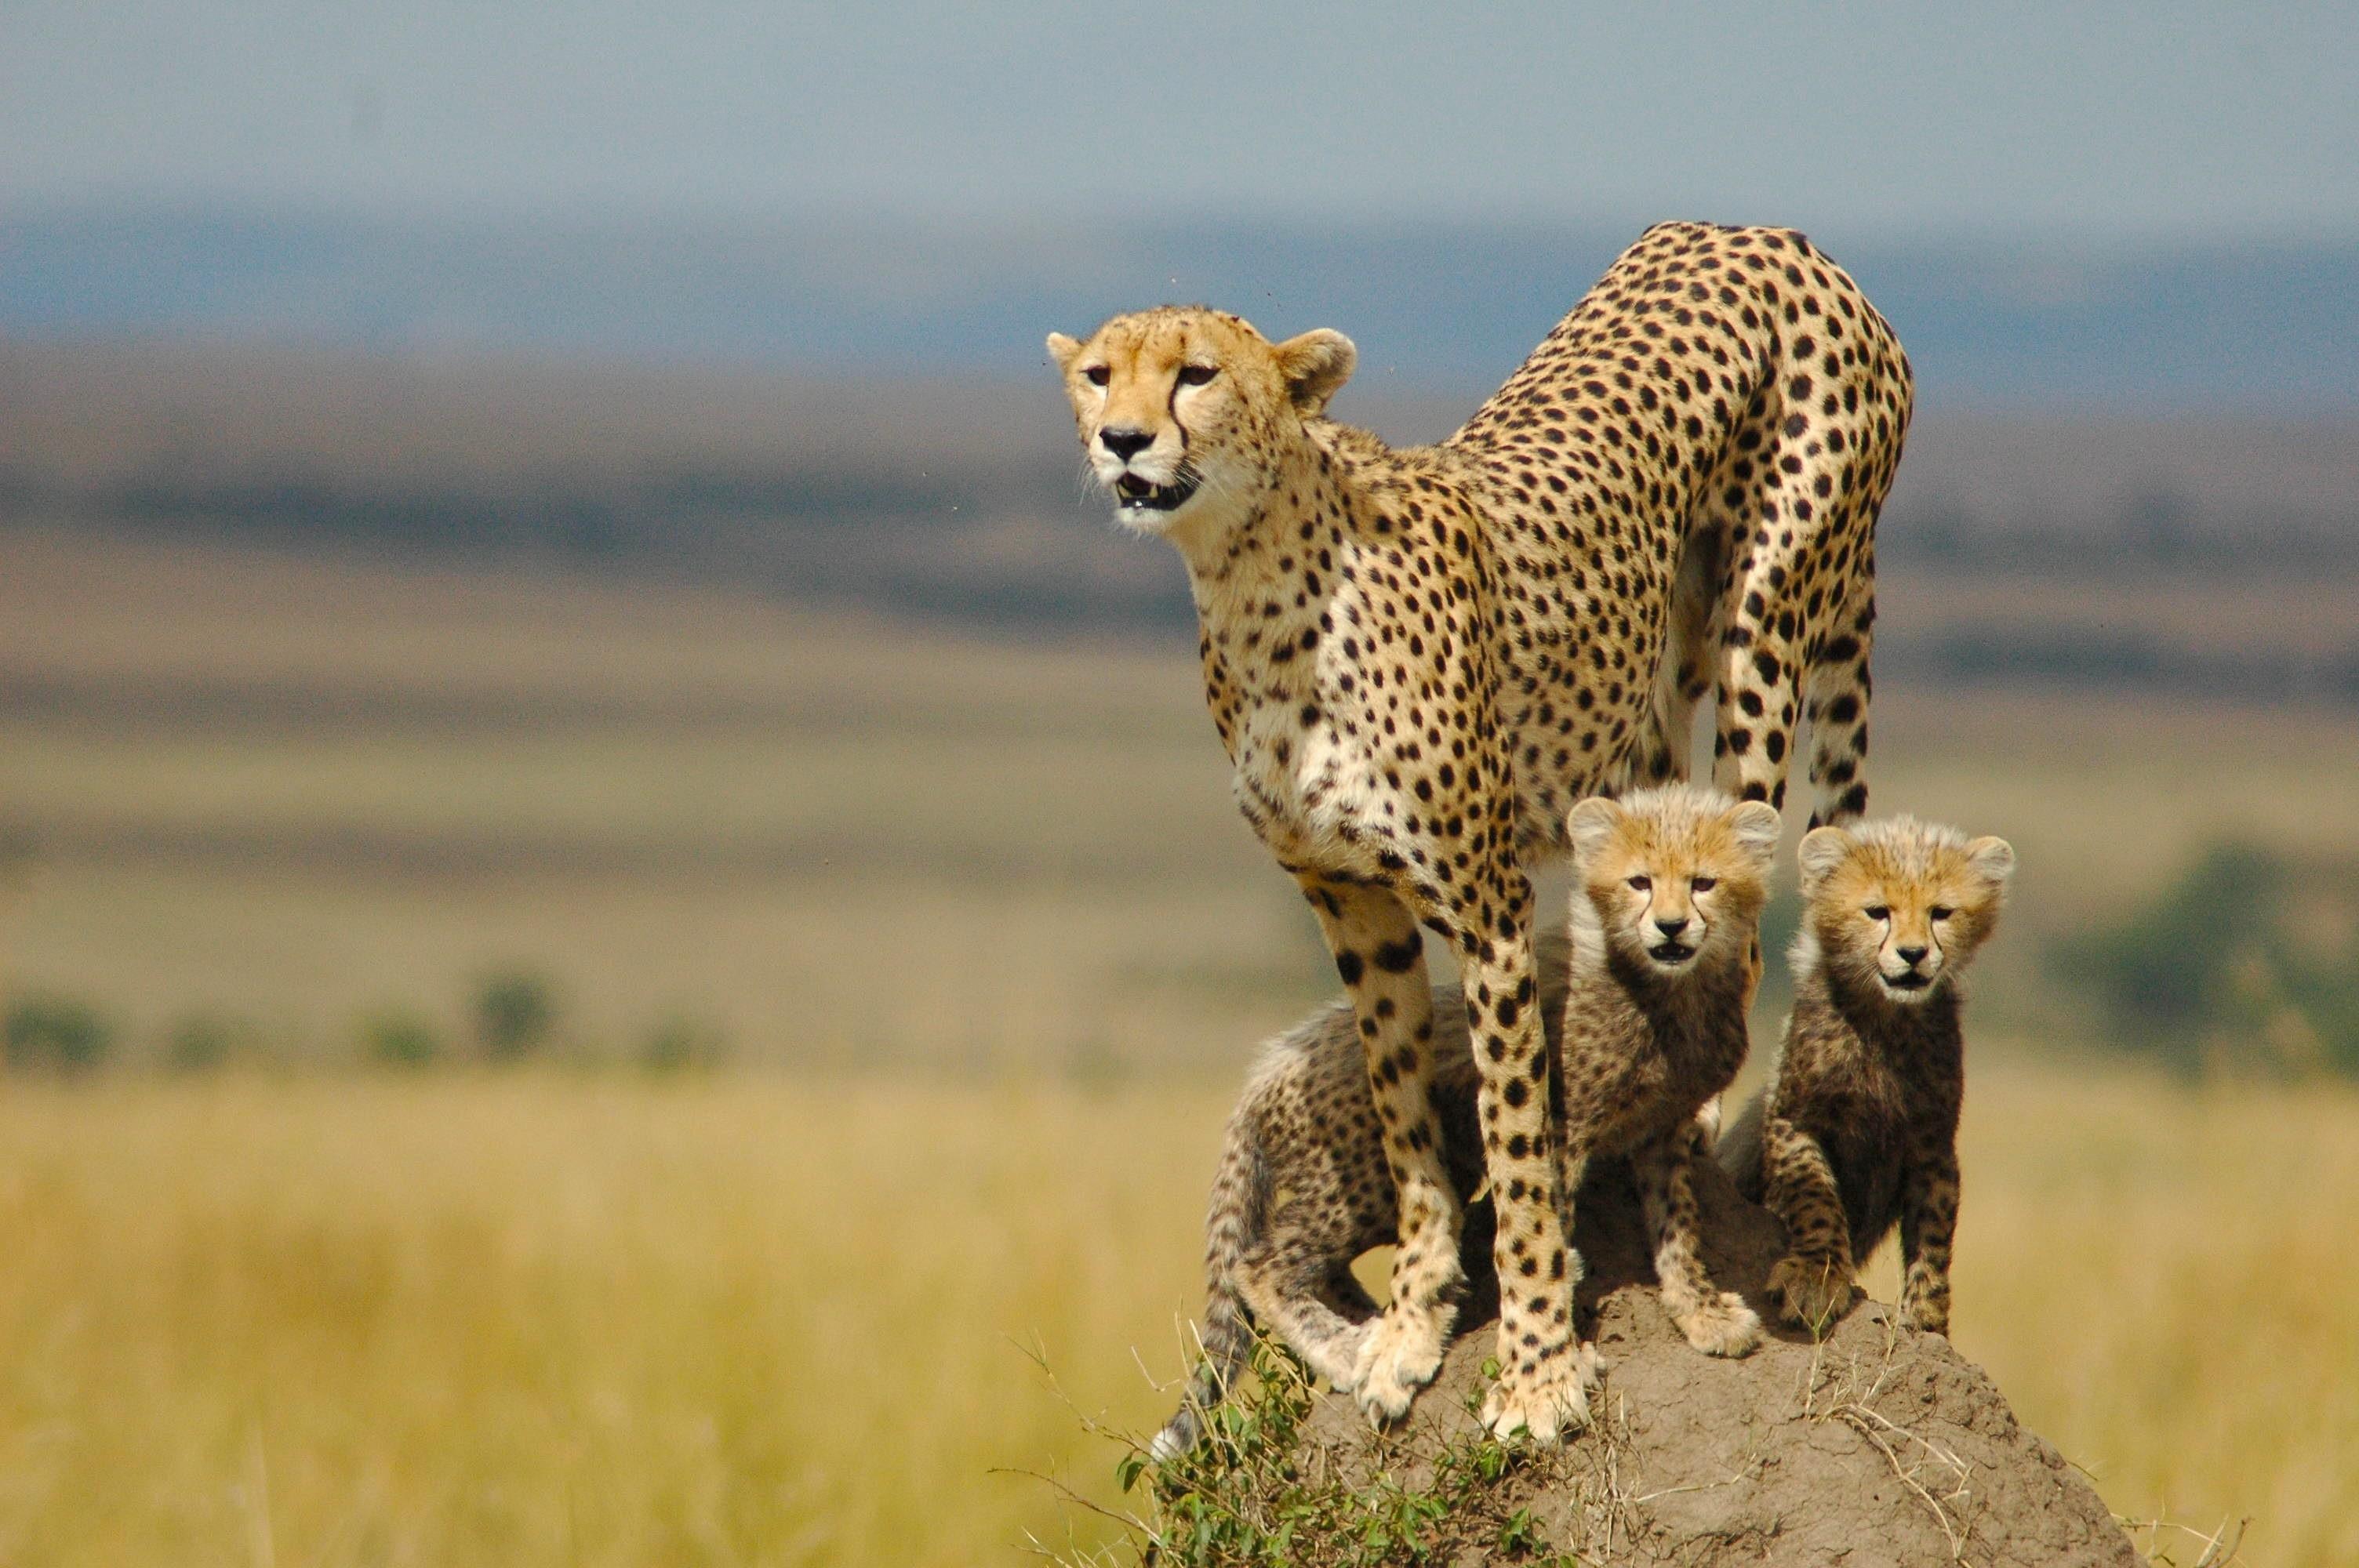 Res: 3008x2000, Cheetah